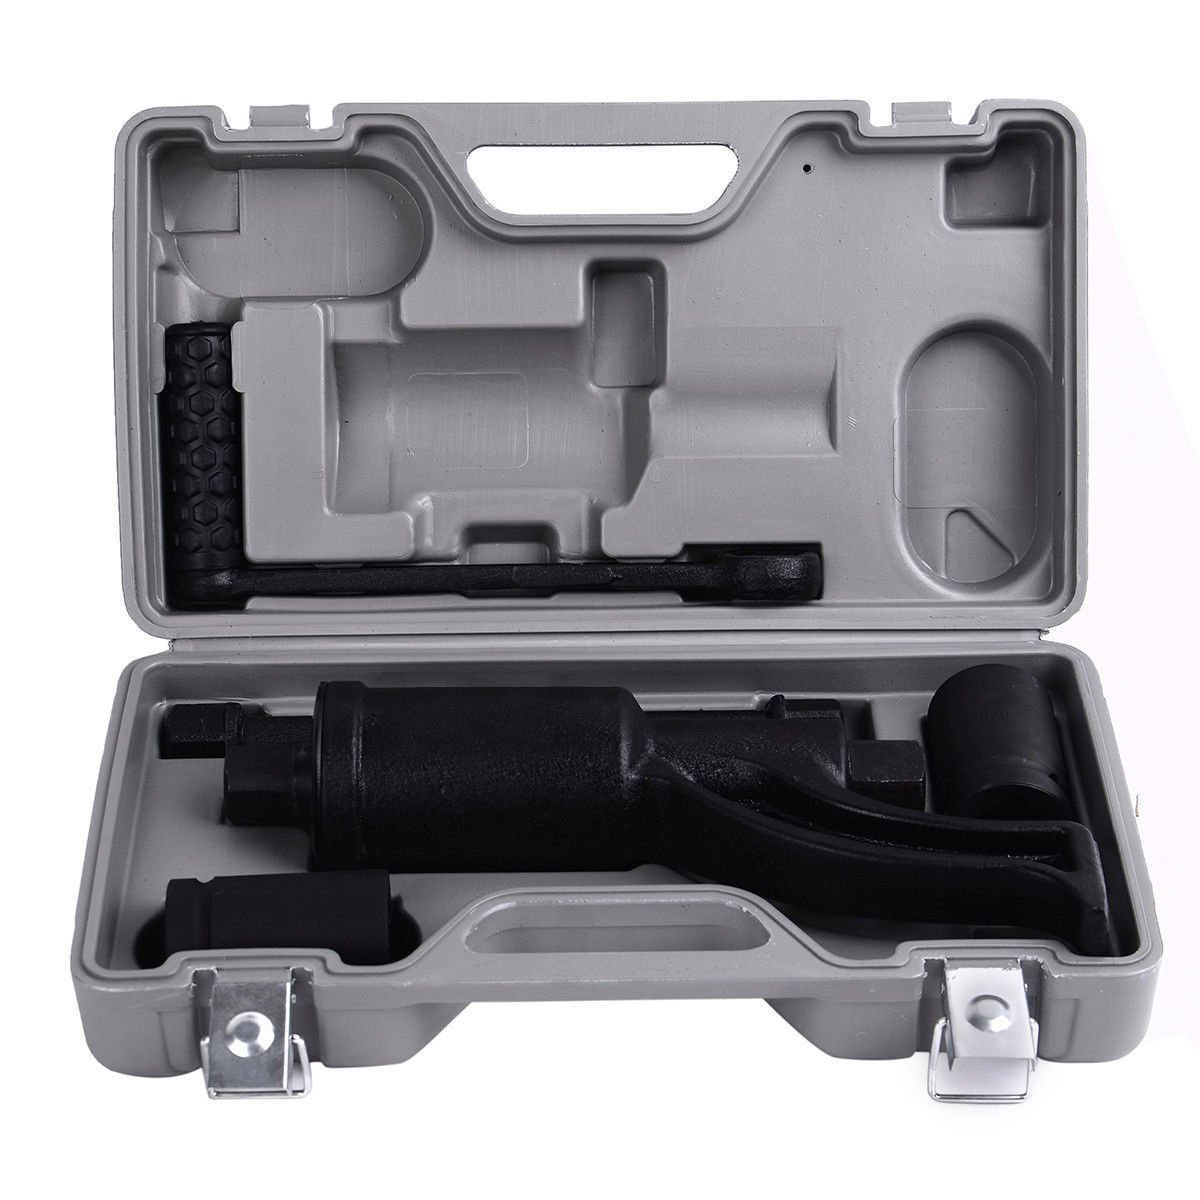 Goplus Torque Multiplier Set Wrench Lug Nut Lugnuts Remover Labor Saving RV Semi Socket